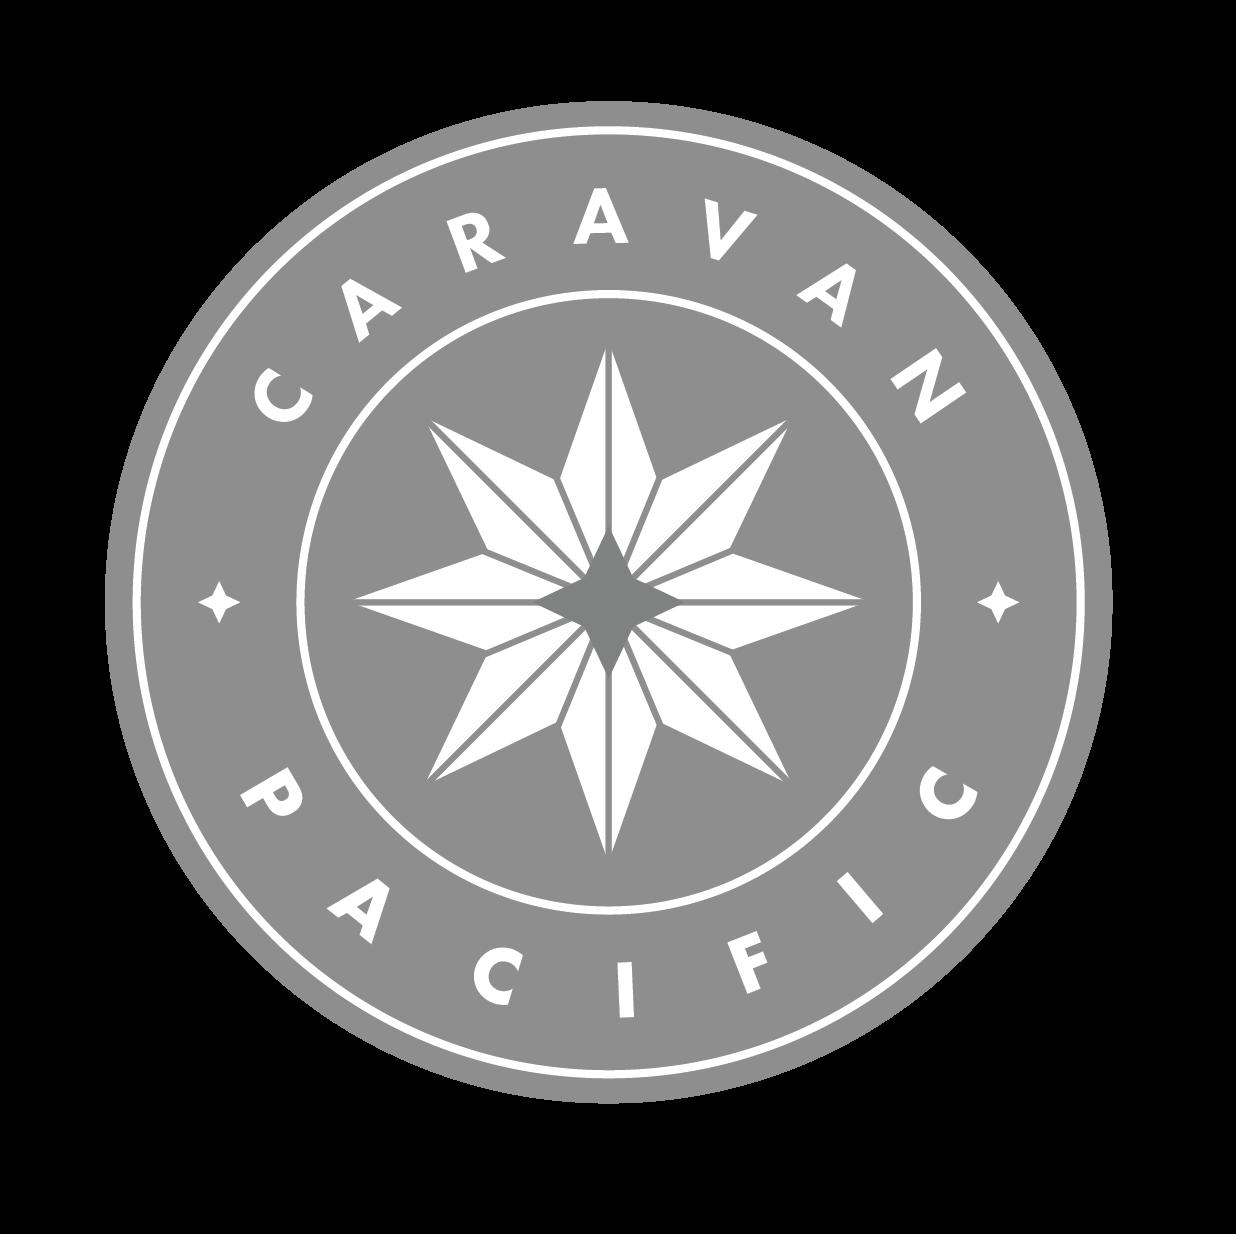 CaravanPacific_WEBSITE-02.png